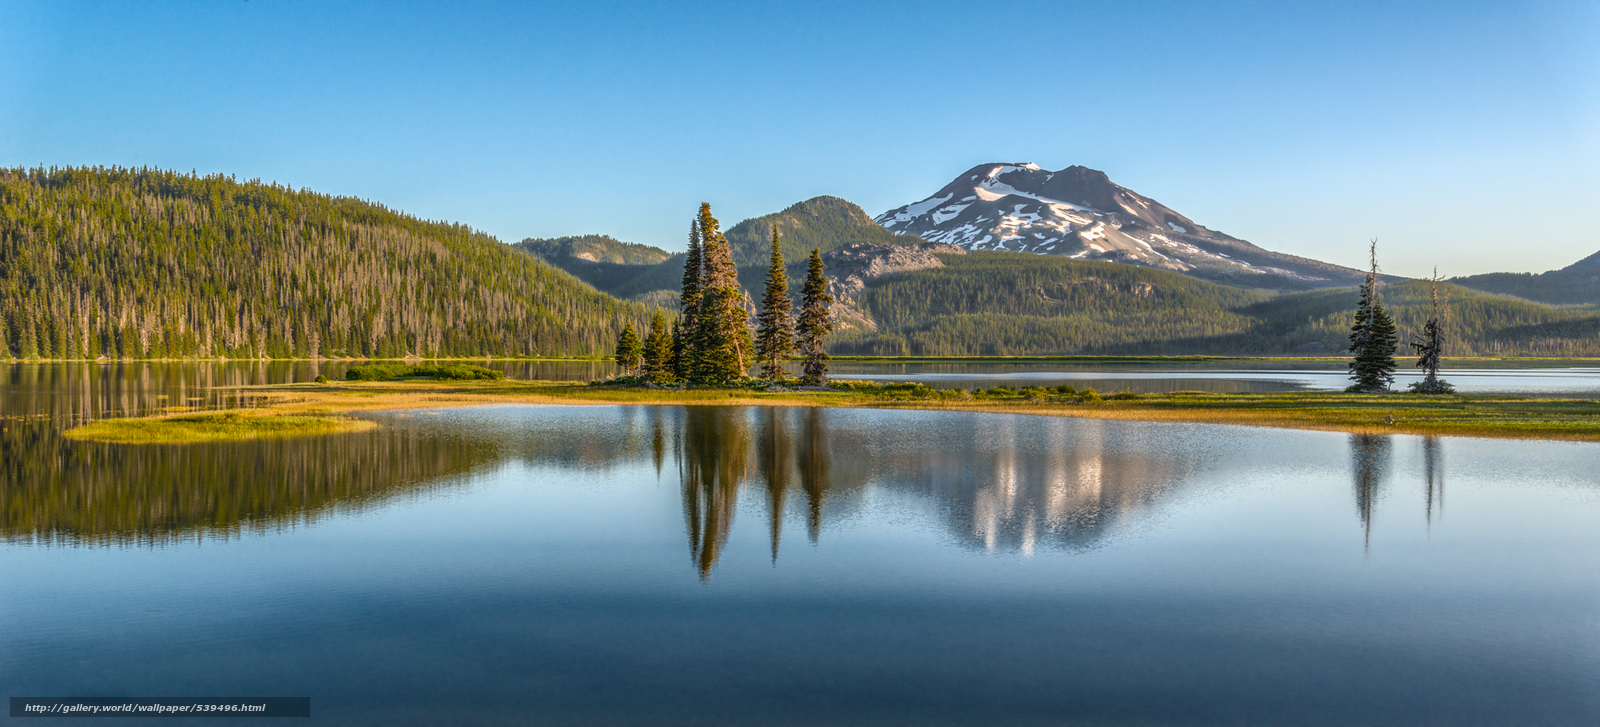 sunrise, South Sister, Sparks lake, Oregon, USA, panorama